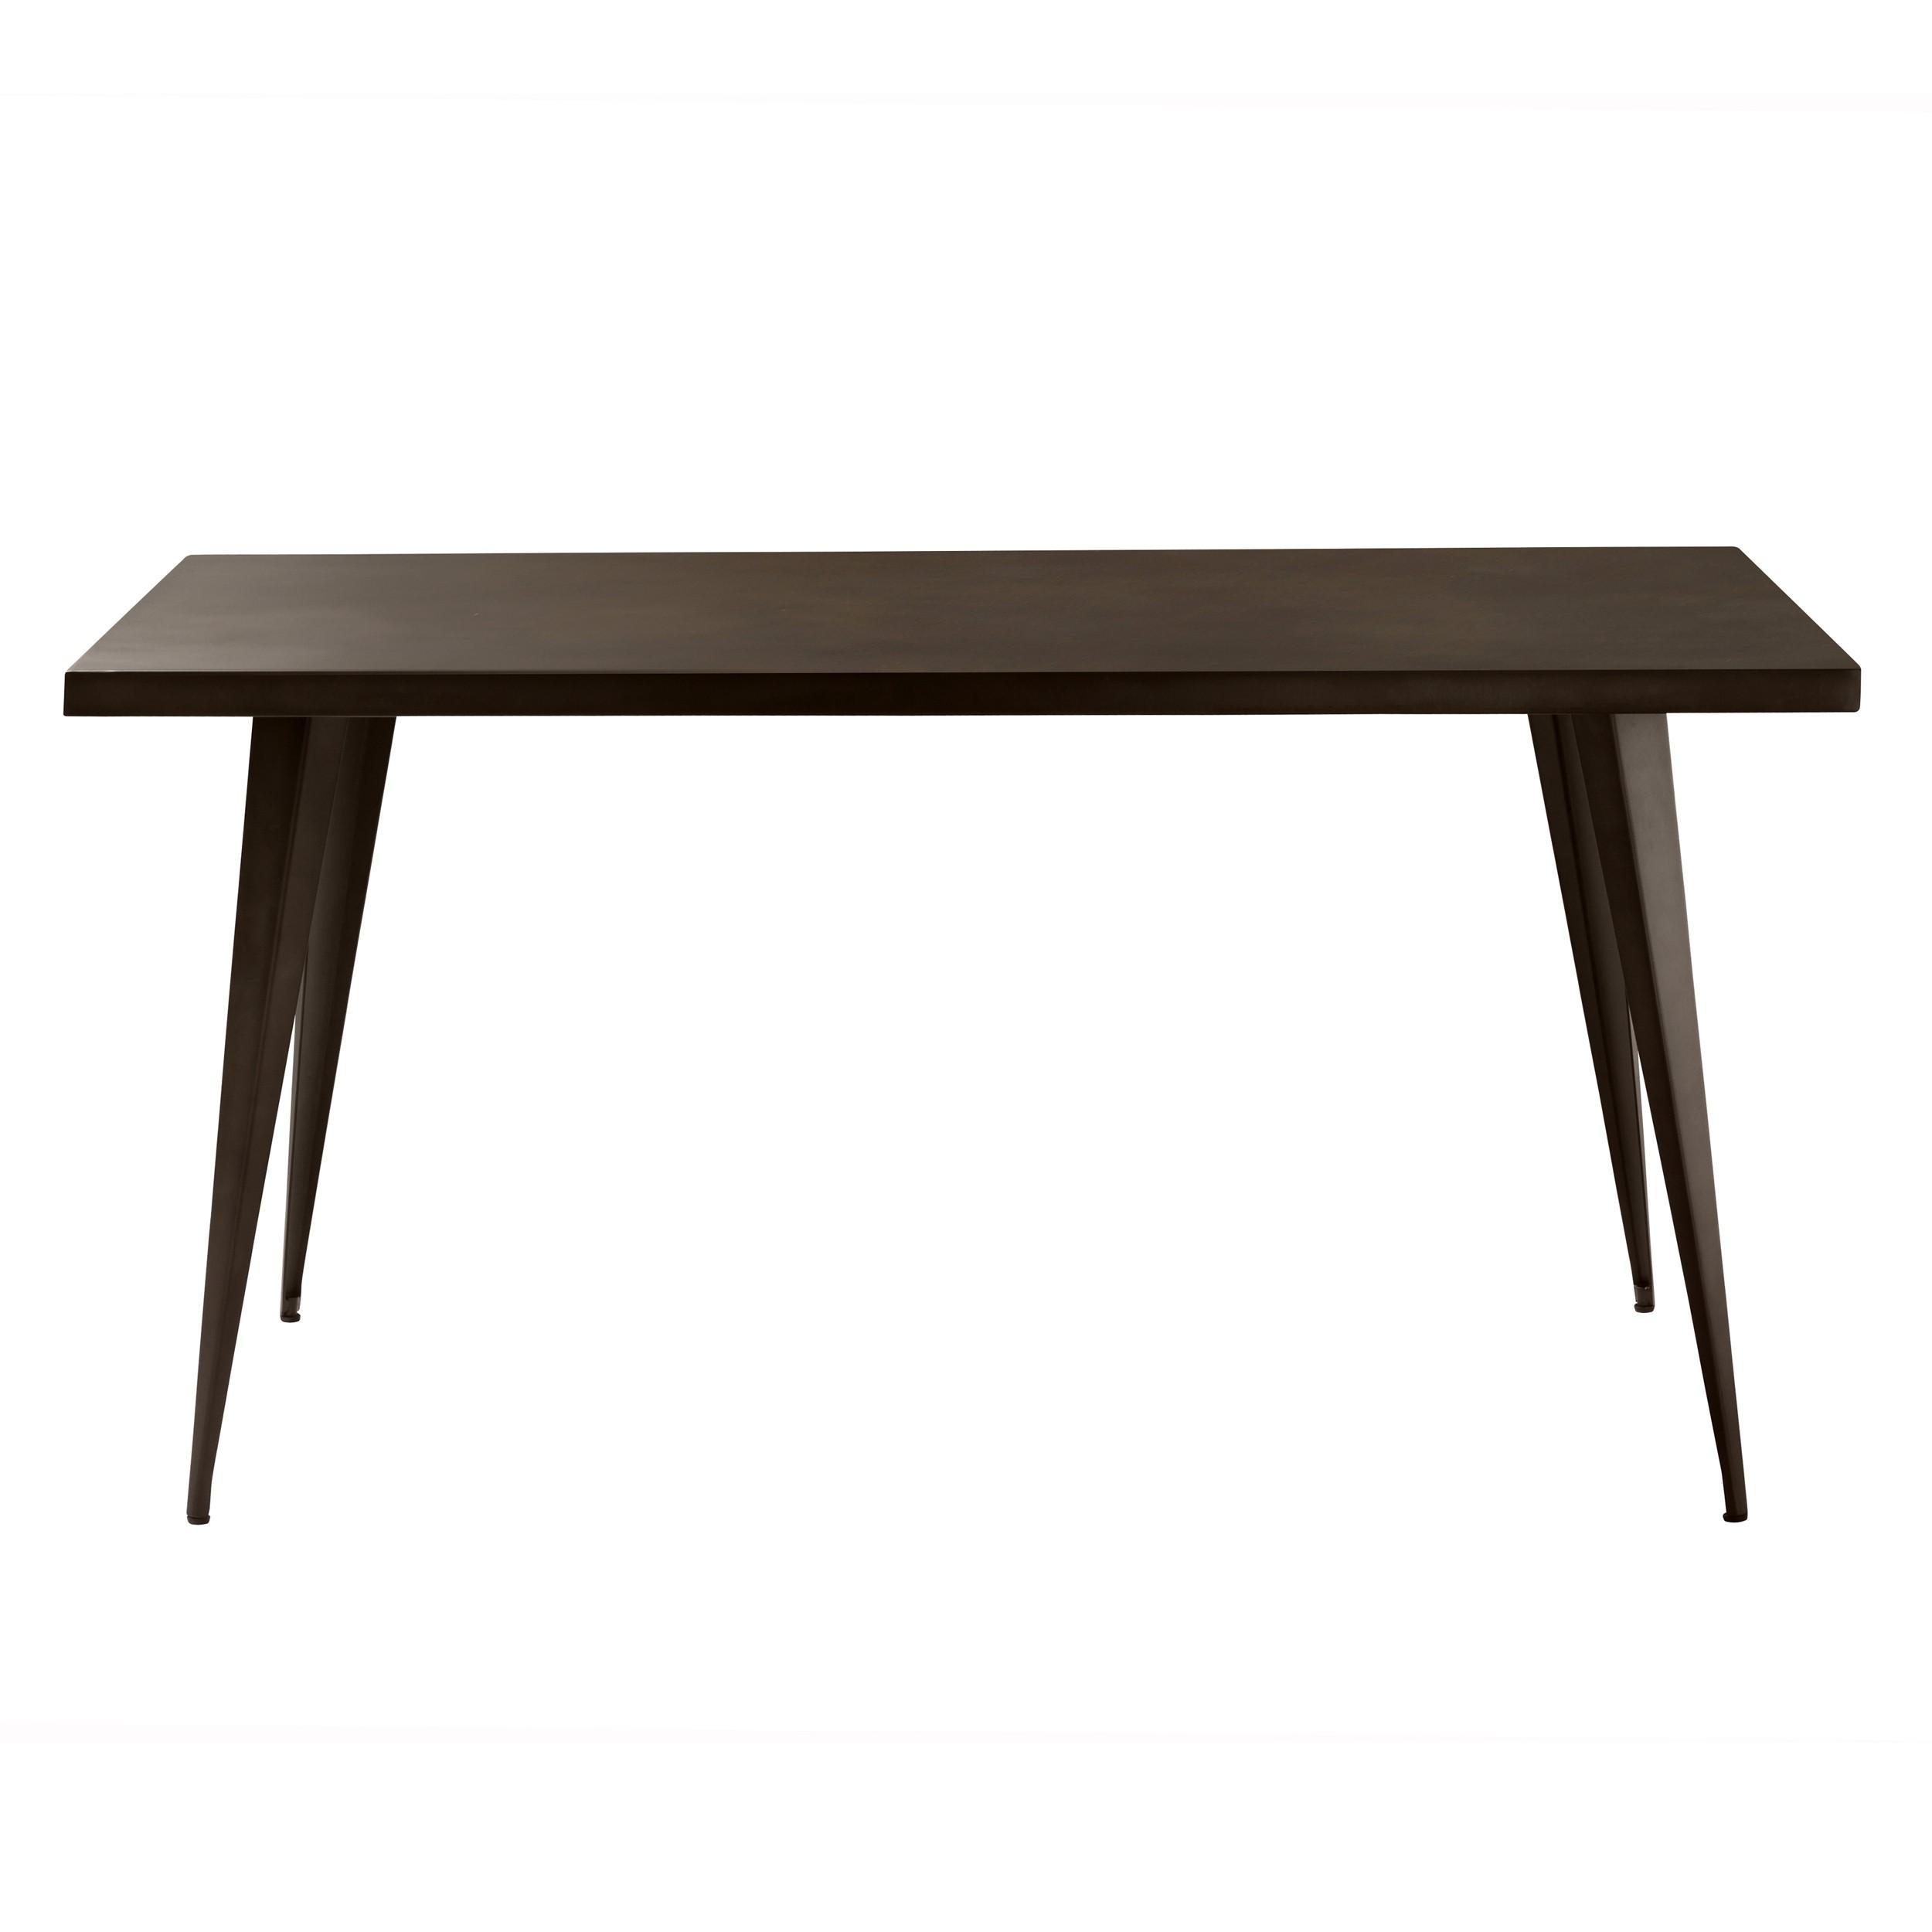 achat table rectangulaire tendance pas cher